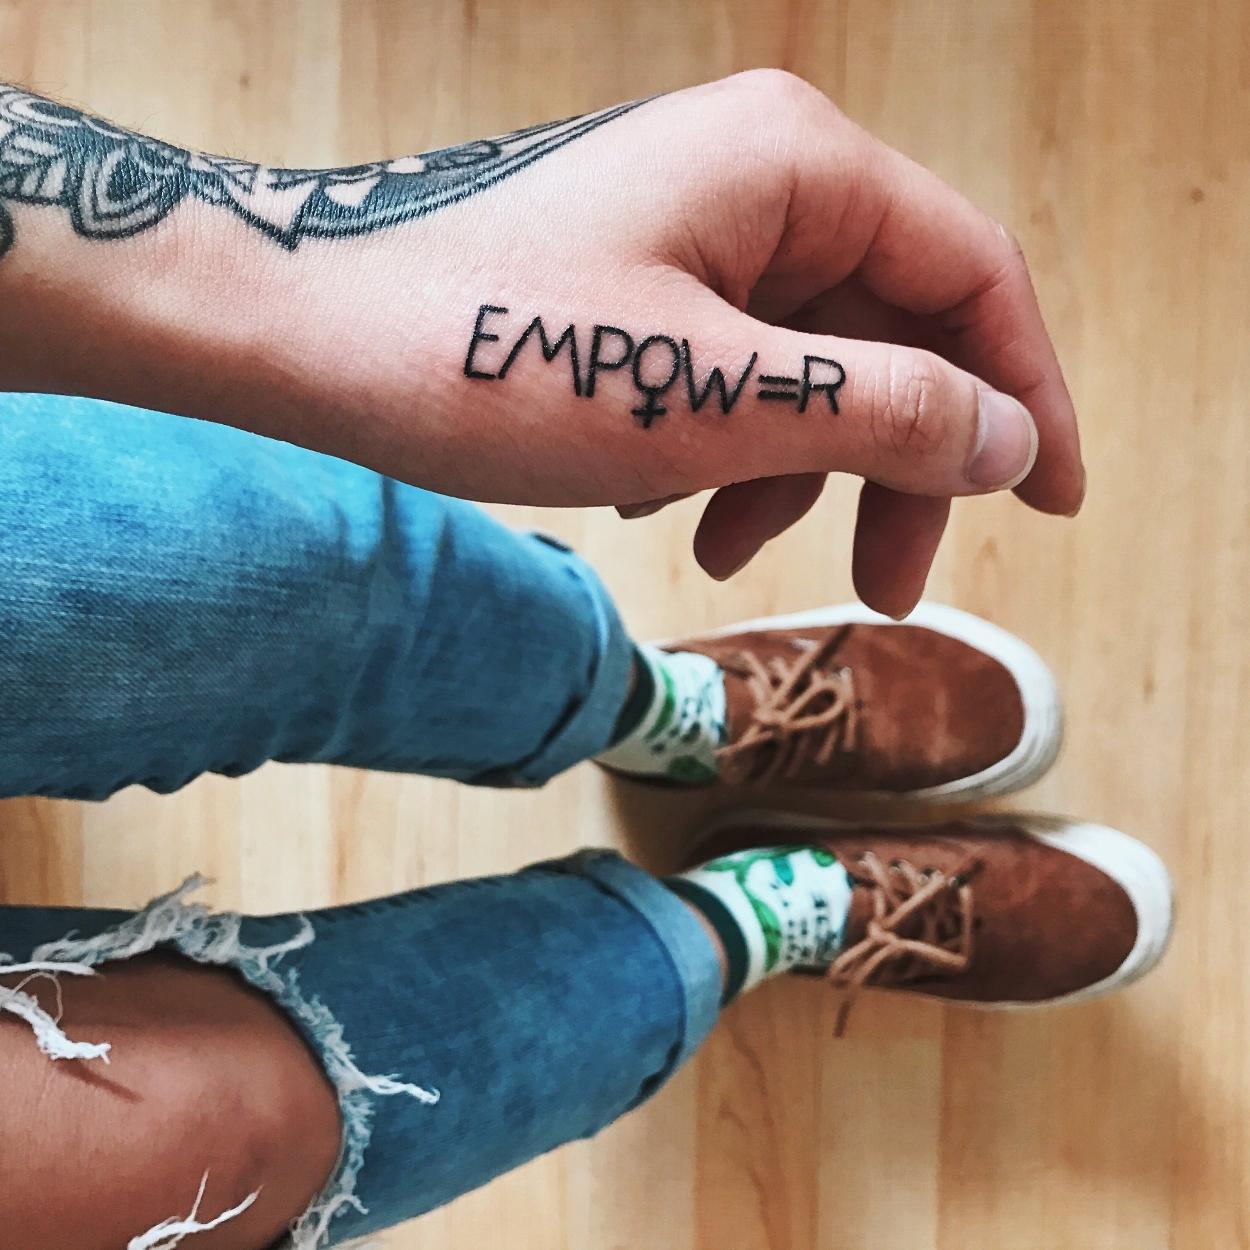 Tattooed done by Nick Flanagan. (3/21/17)